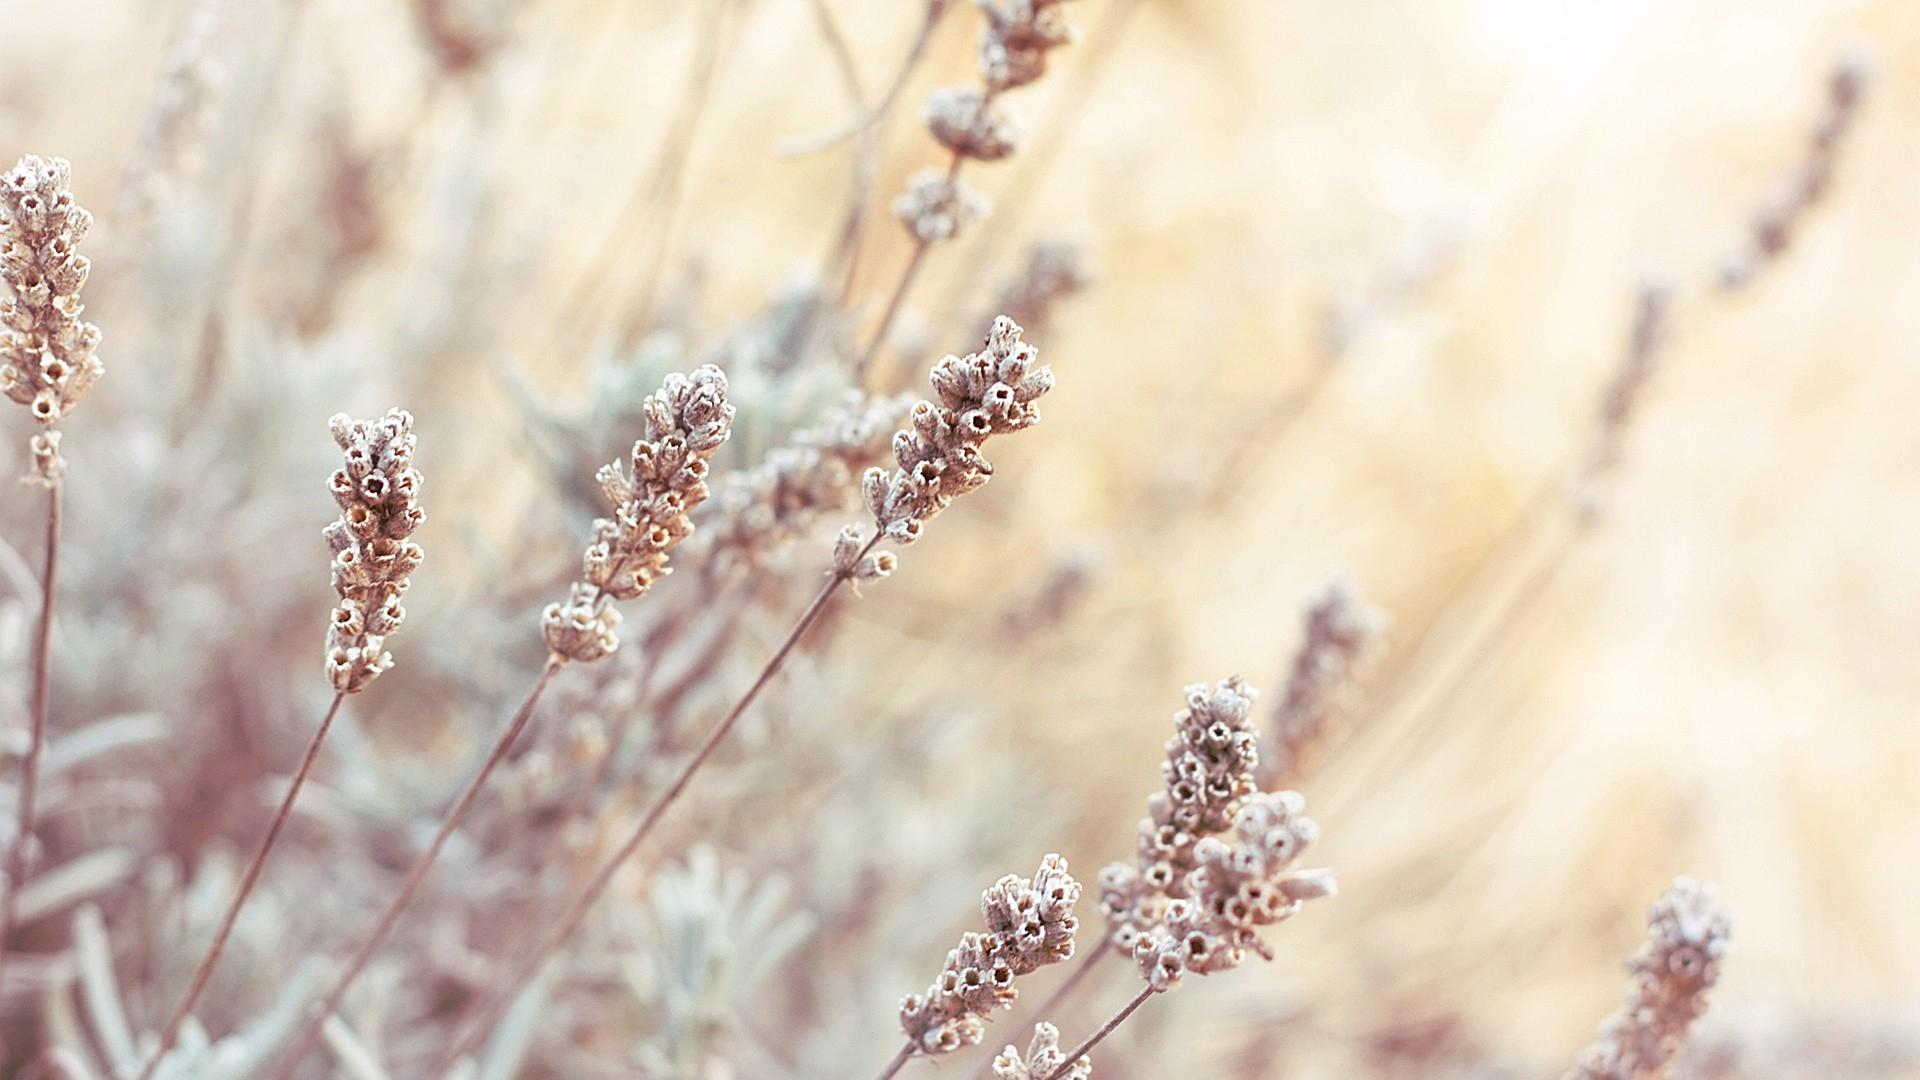 Bright depth of field plants Mac Wallpaper Download | Free ...